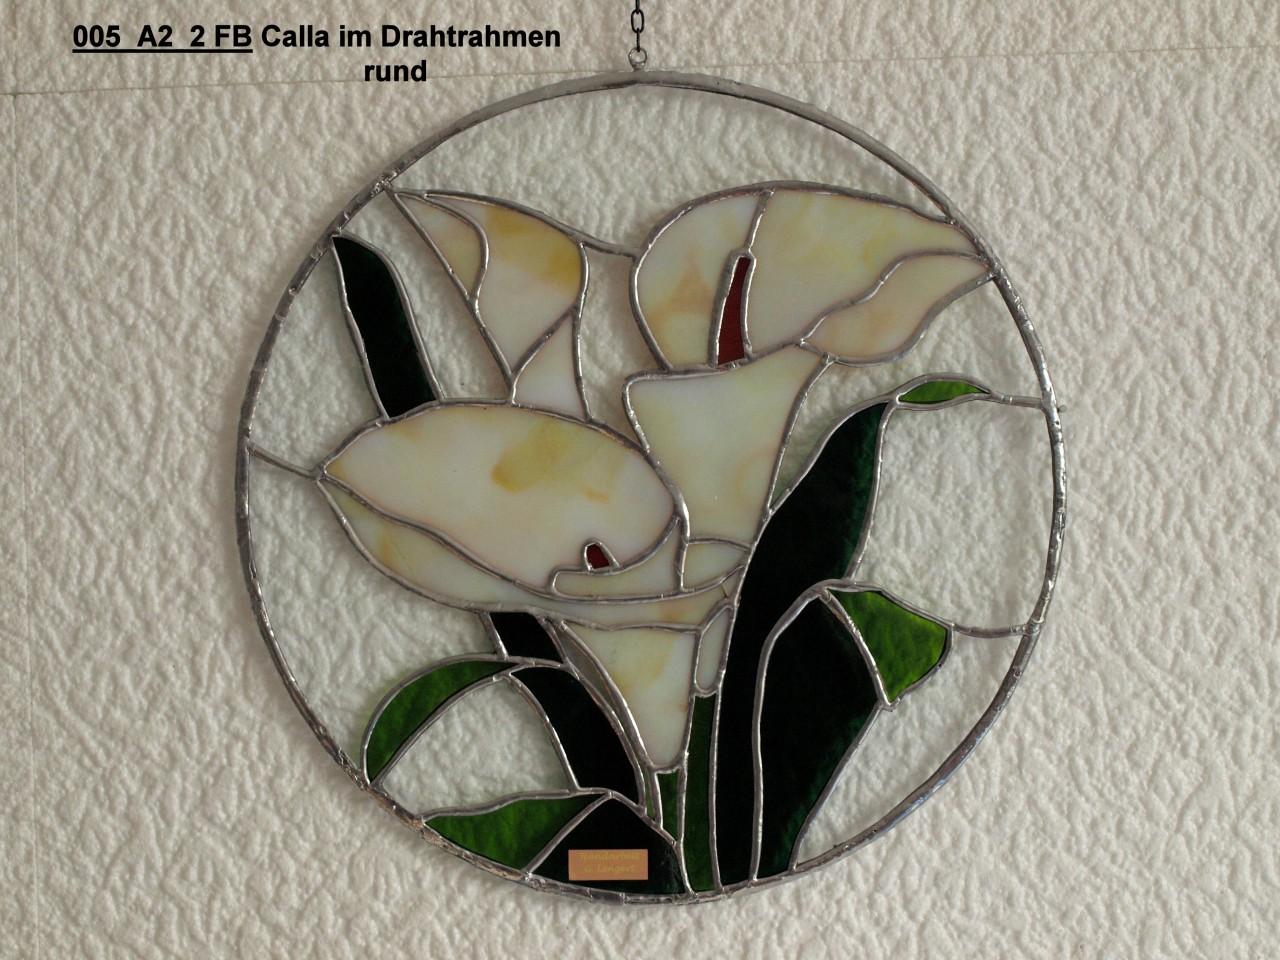 Gerhard Lengert - Meine Werke